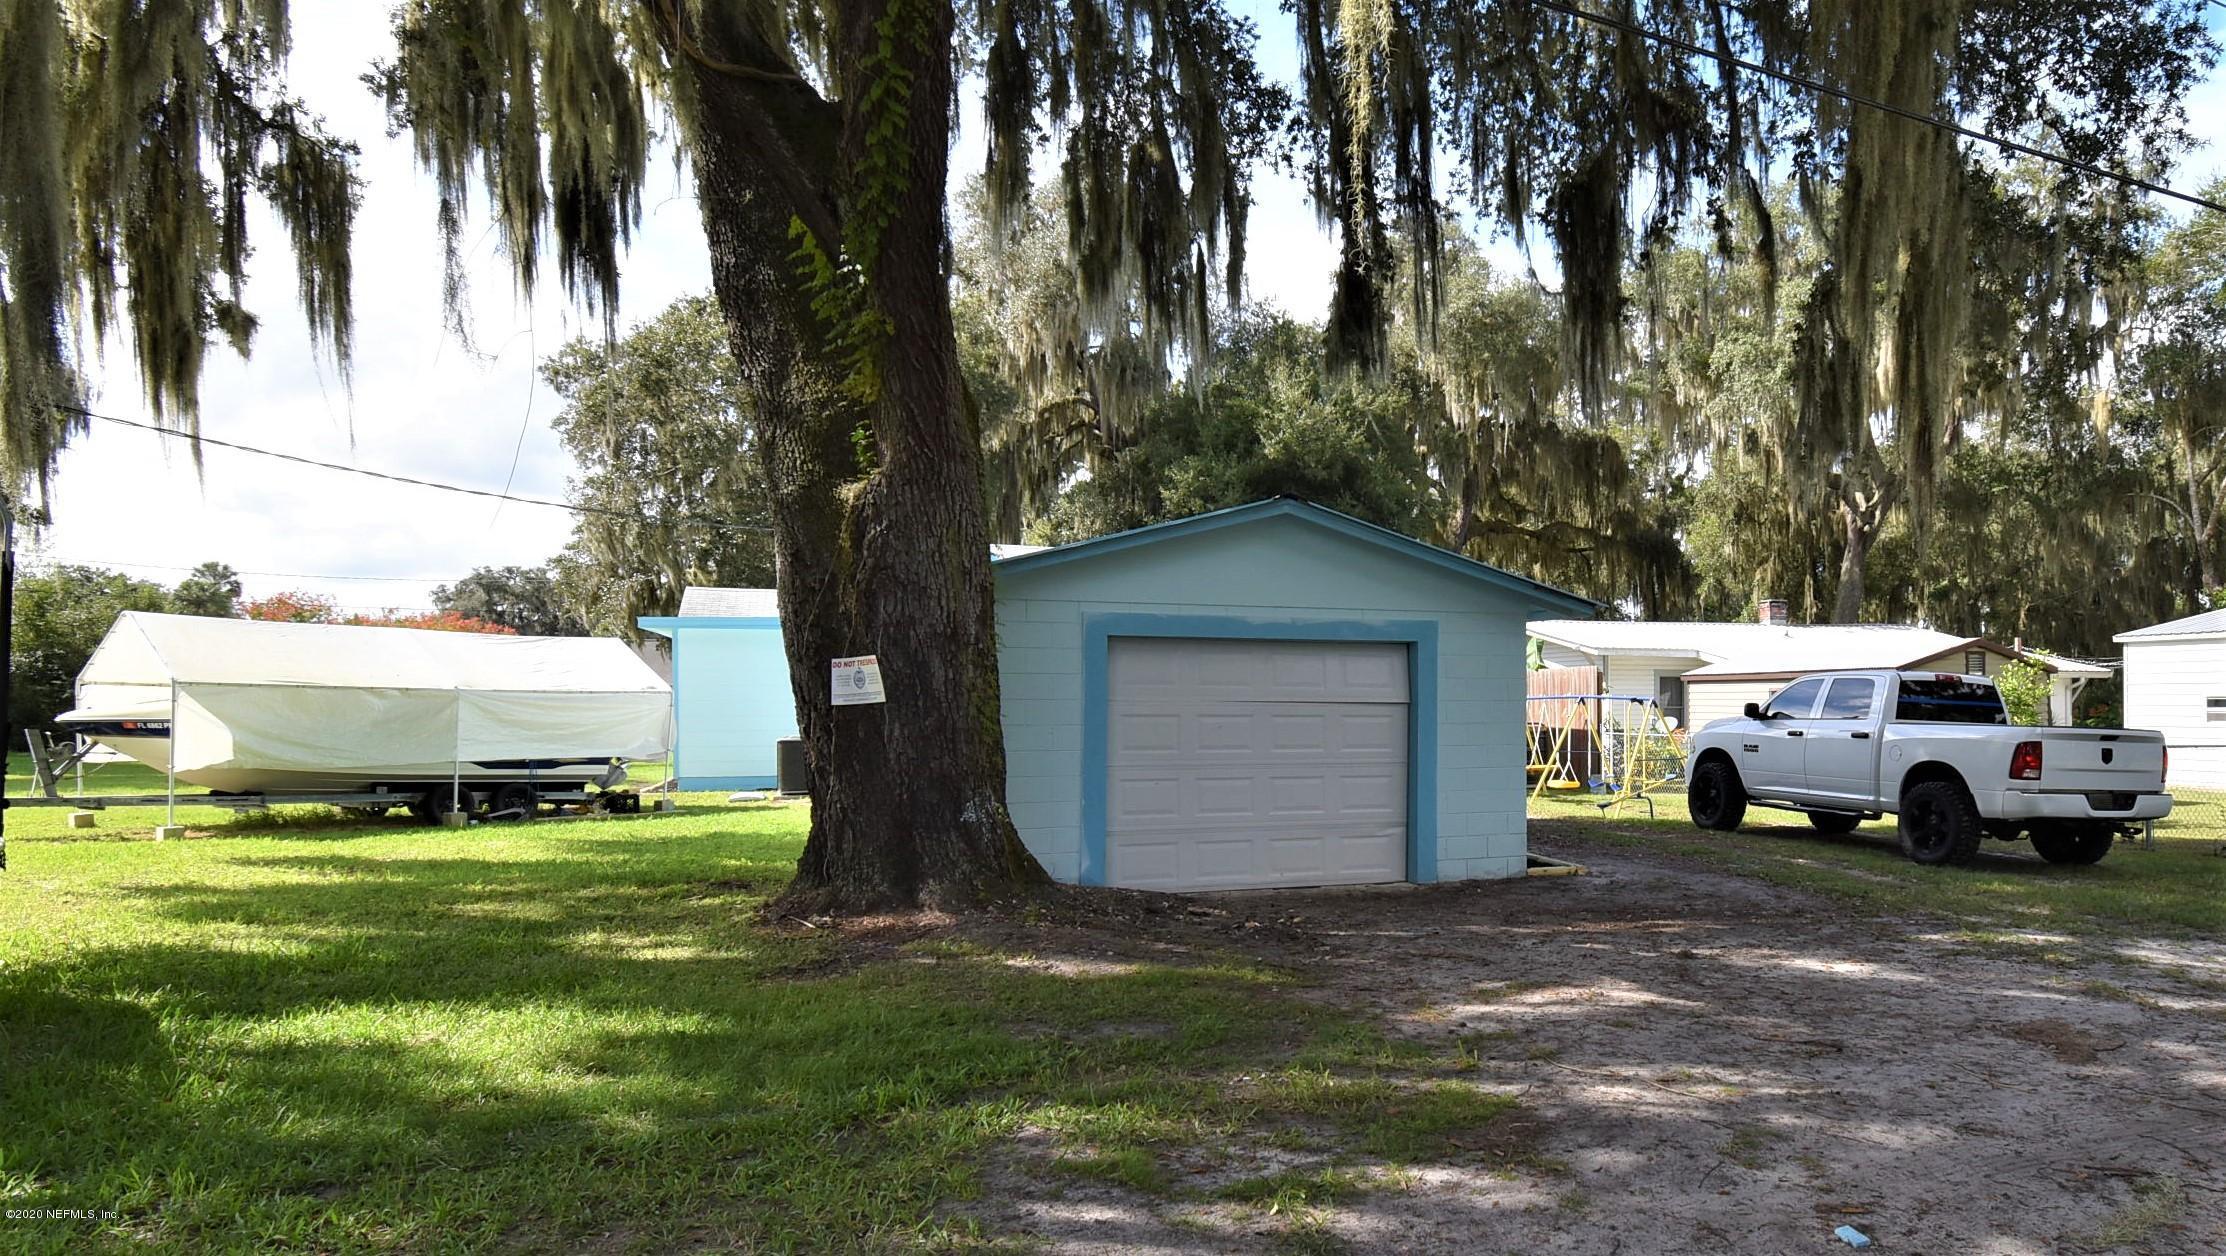 317 CHESTNUT, CRESCENT CITY, FLORIDA 32112, 4 Bedrooms Bedrooms, ,2 BathroomsBathrooms,Residential,For sale,CHESTNUT,1080995